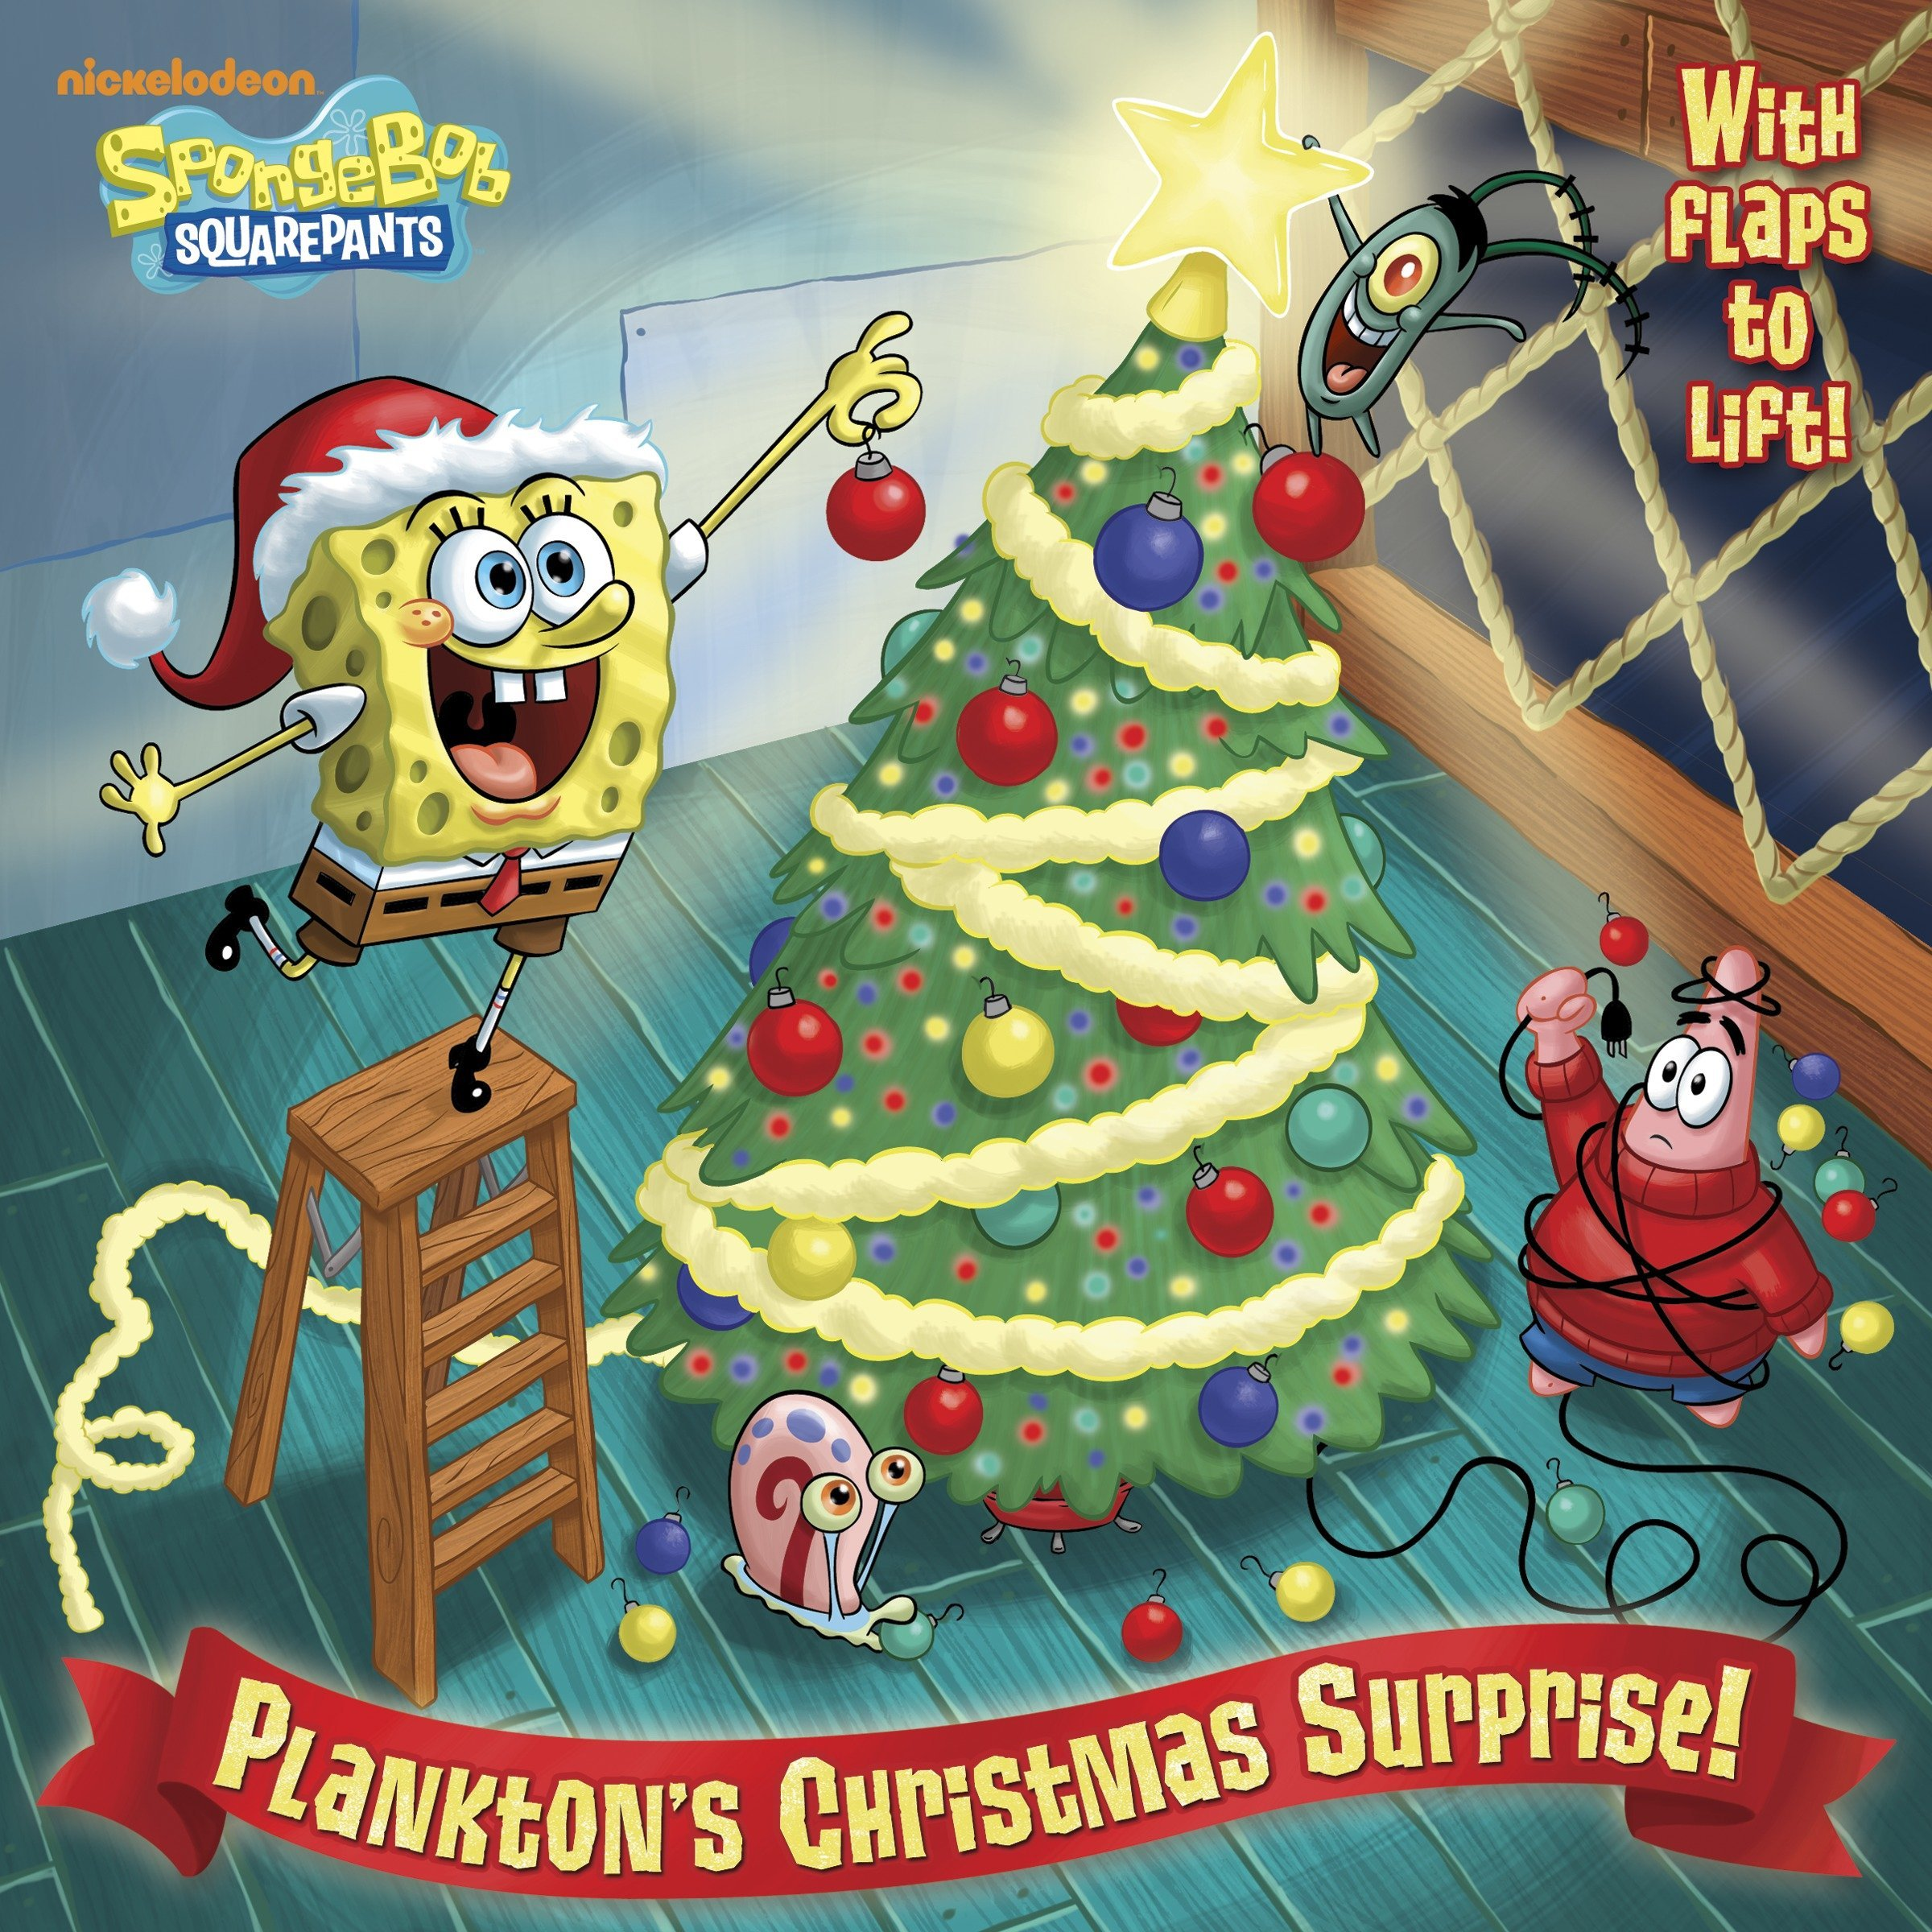 Plankton's Christmas Surprise!